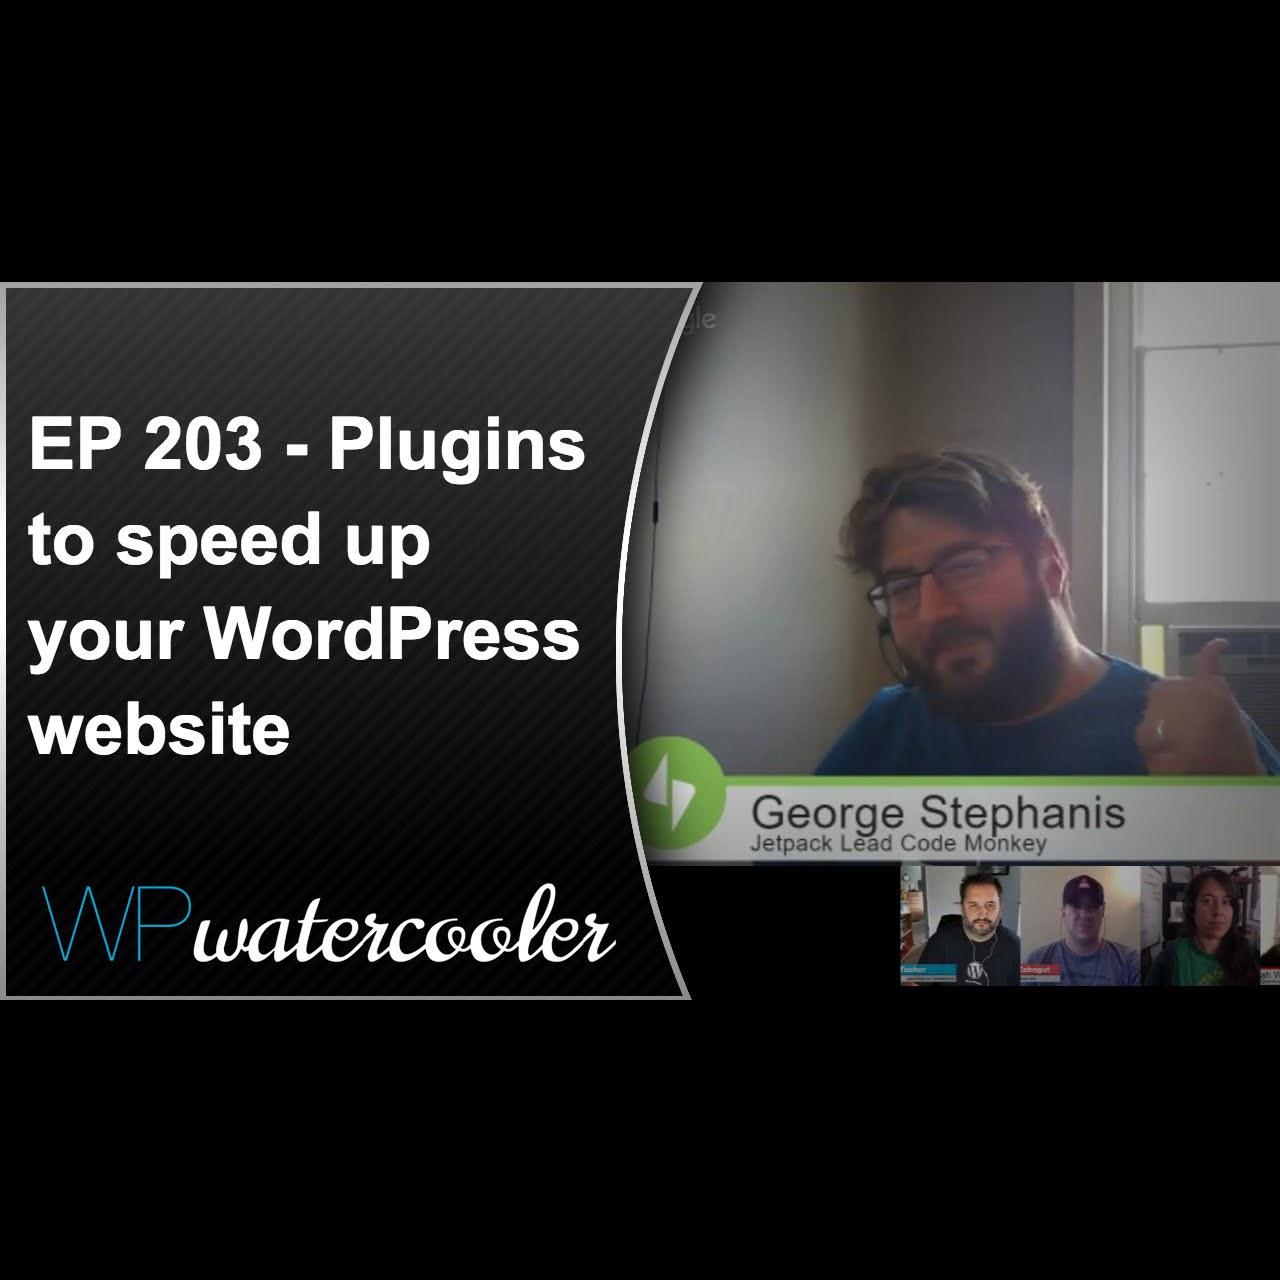 EP203 - Plugins to speed up your WordPress website PodcastFi